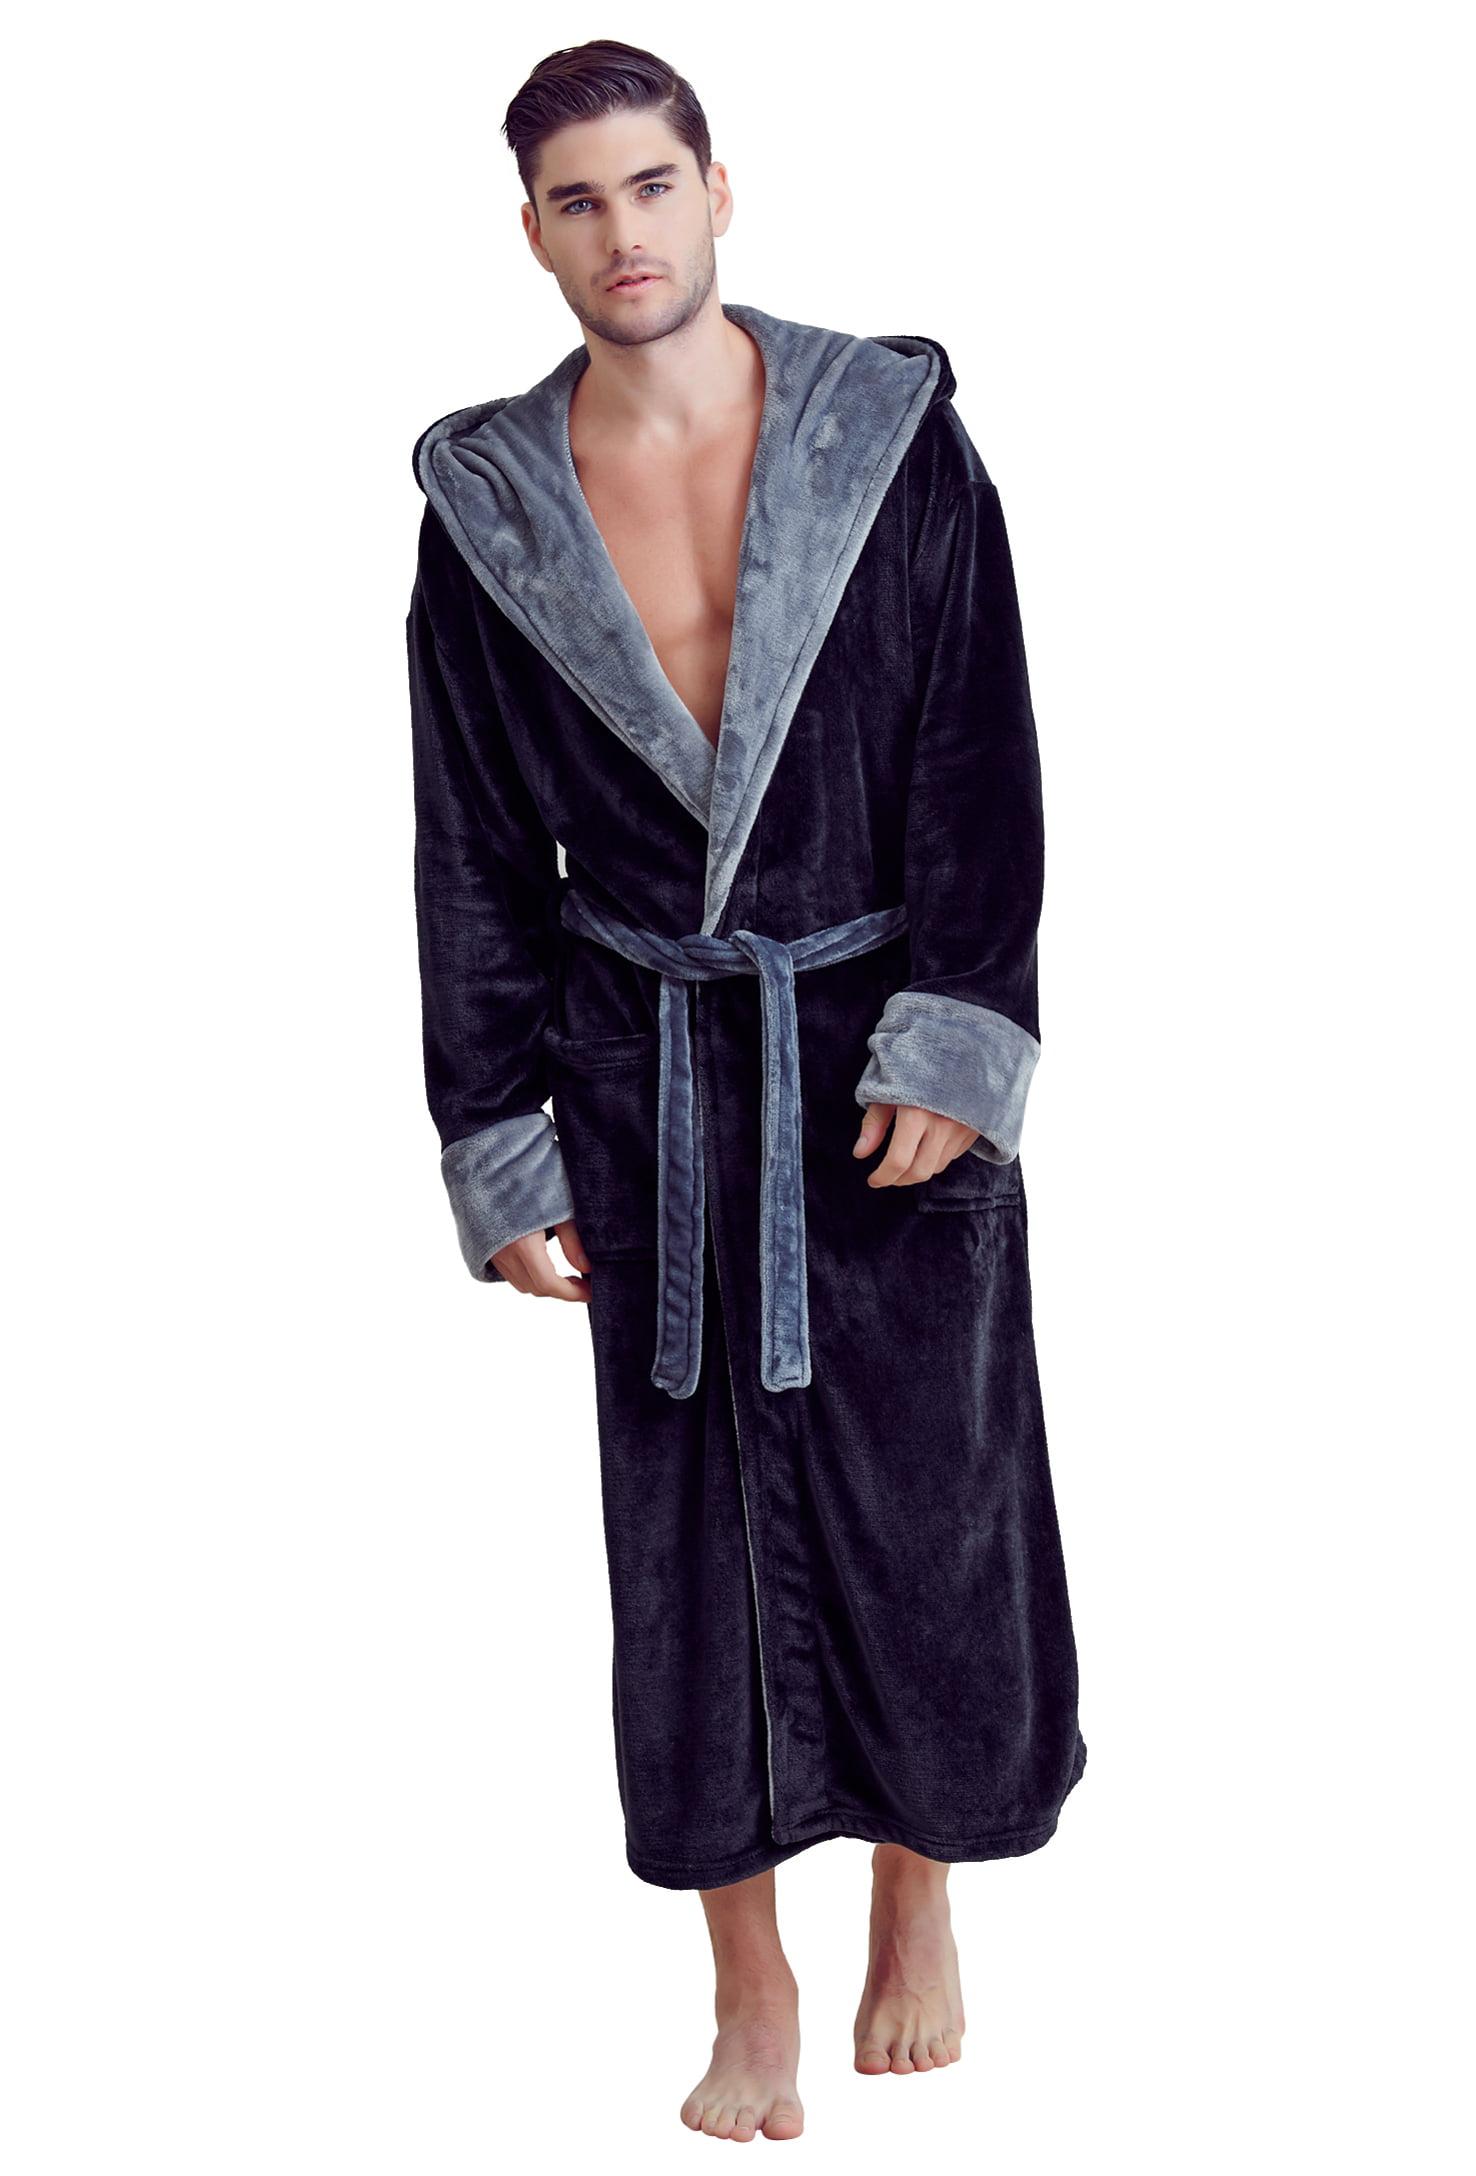 Towelnrobe Soft Touch Linen Men S Bath Robe Hooded Shower Robe Polyester Full Length Warm Kimono Walmart Com Walmart Com